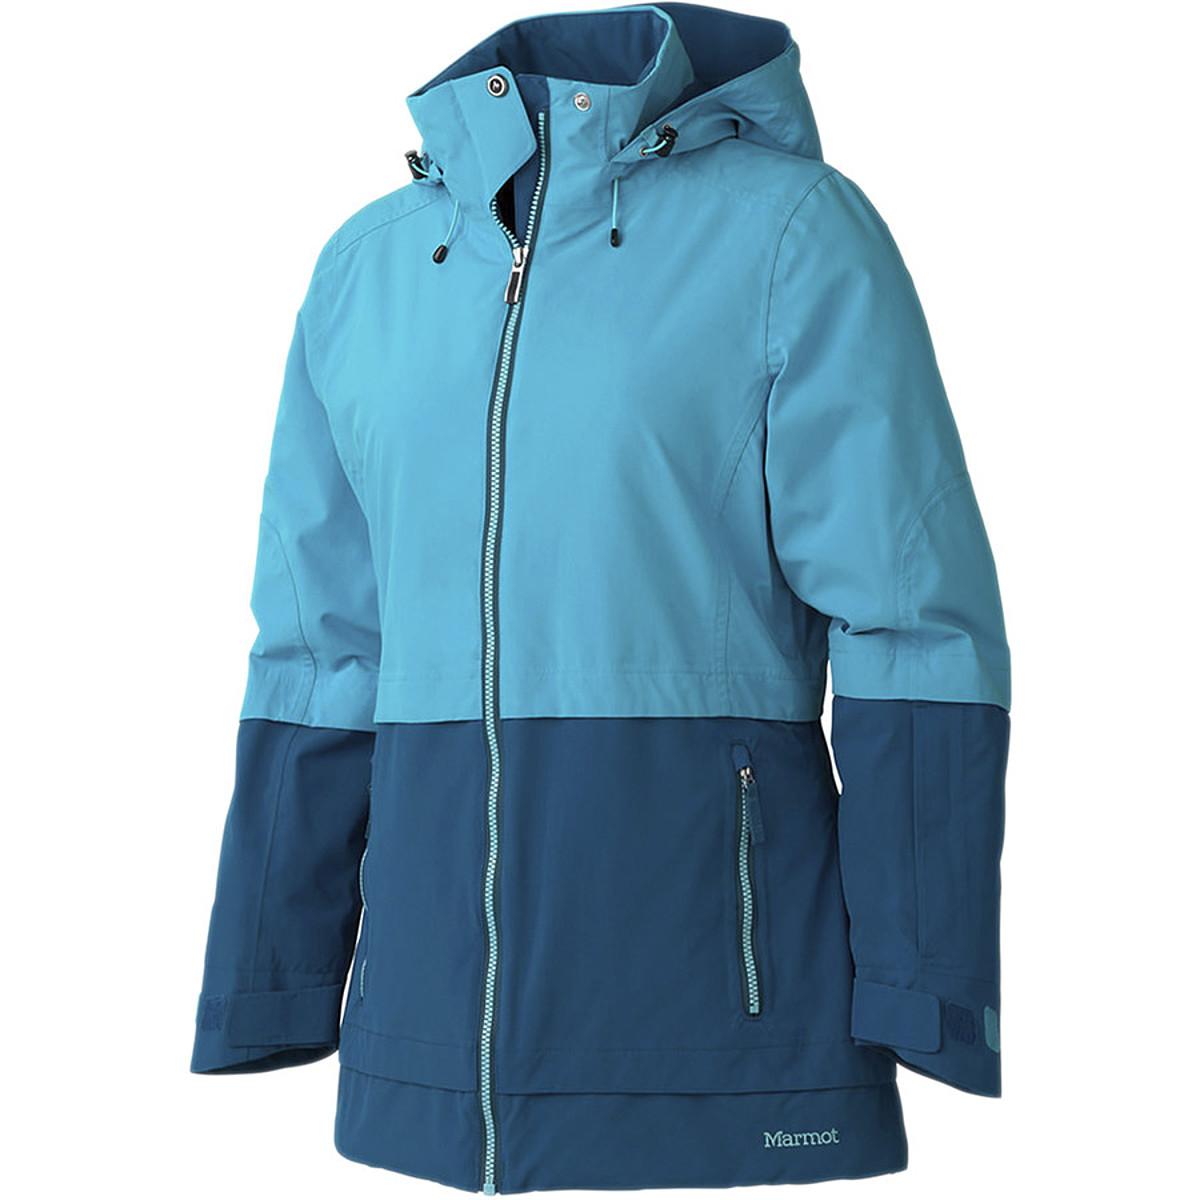 Marmot Excellerator Jacket